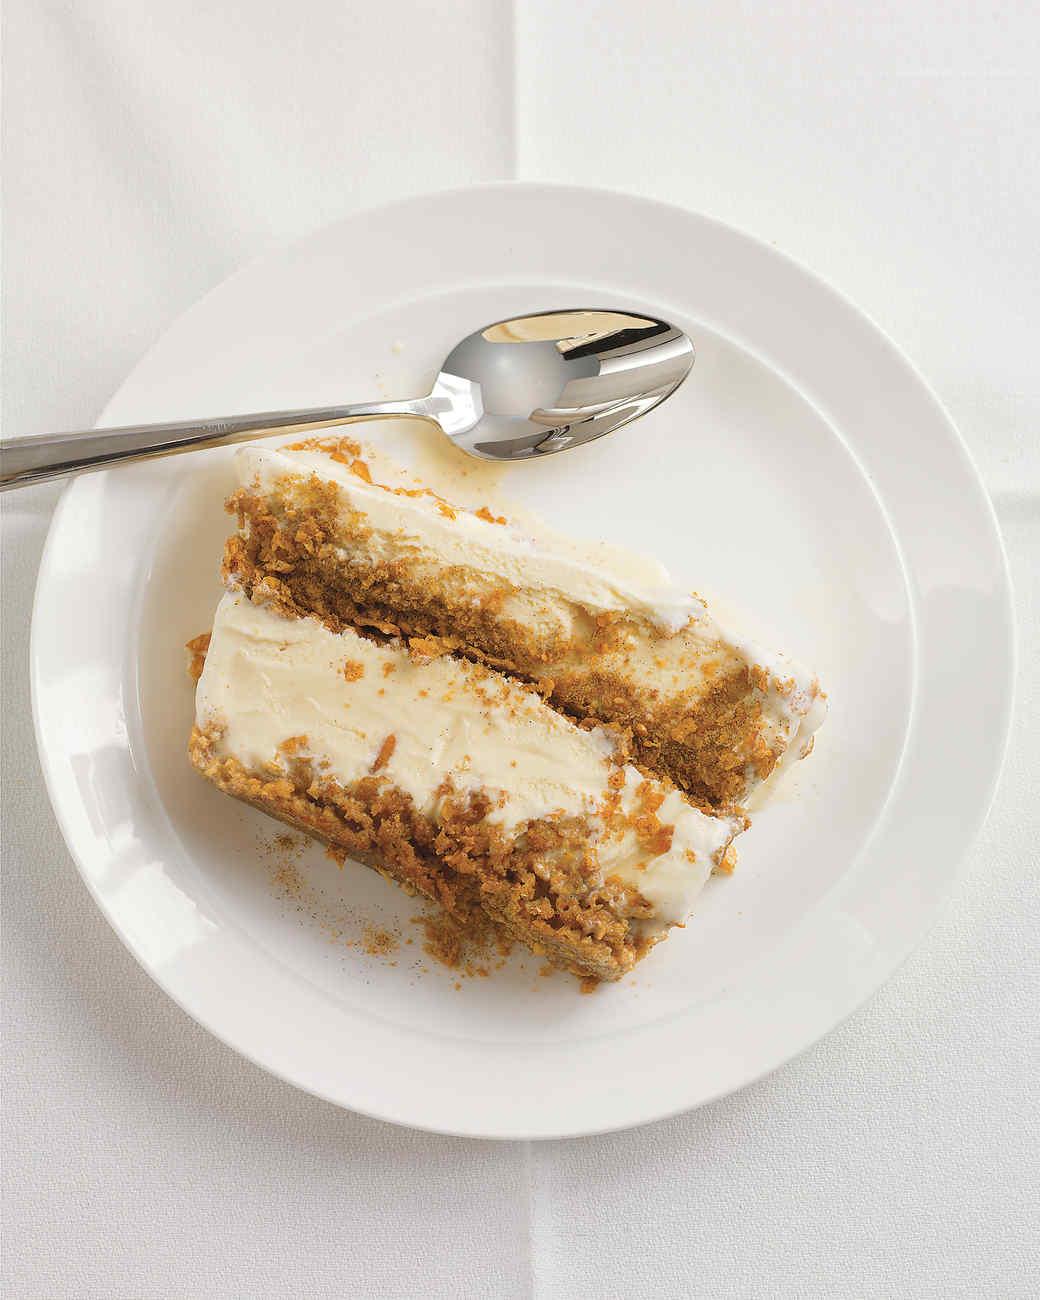 crunch-ice-cream-loaf-0706-med102230.jpg